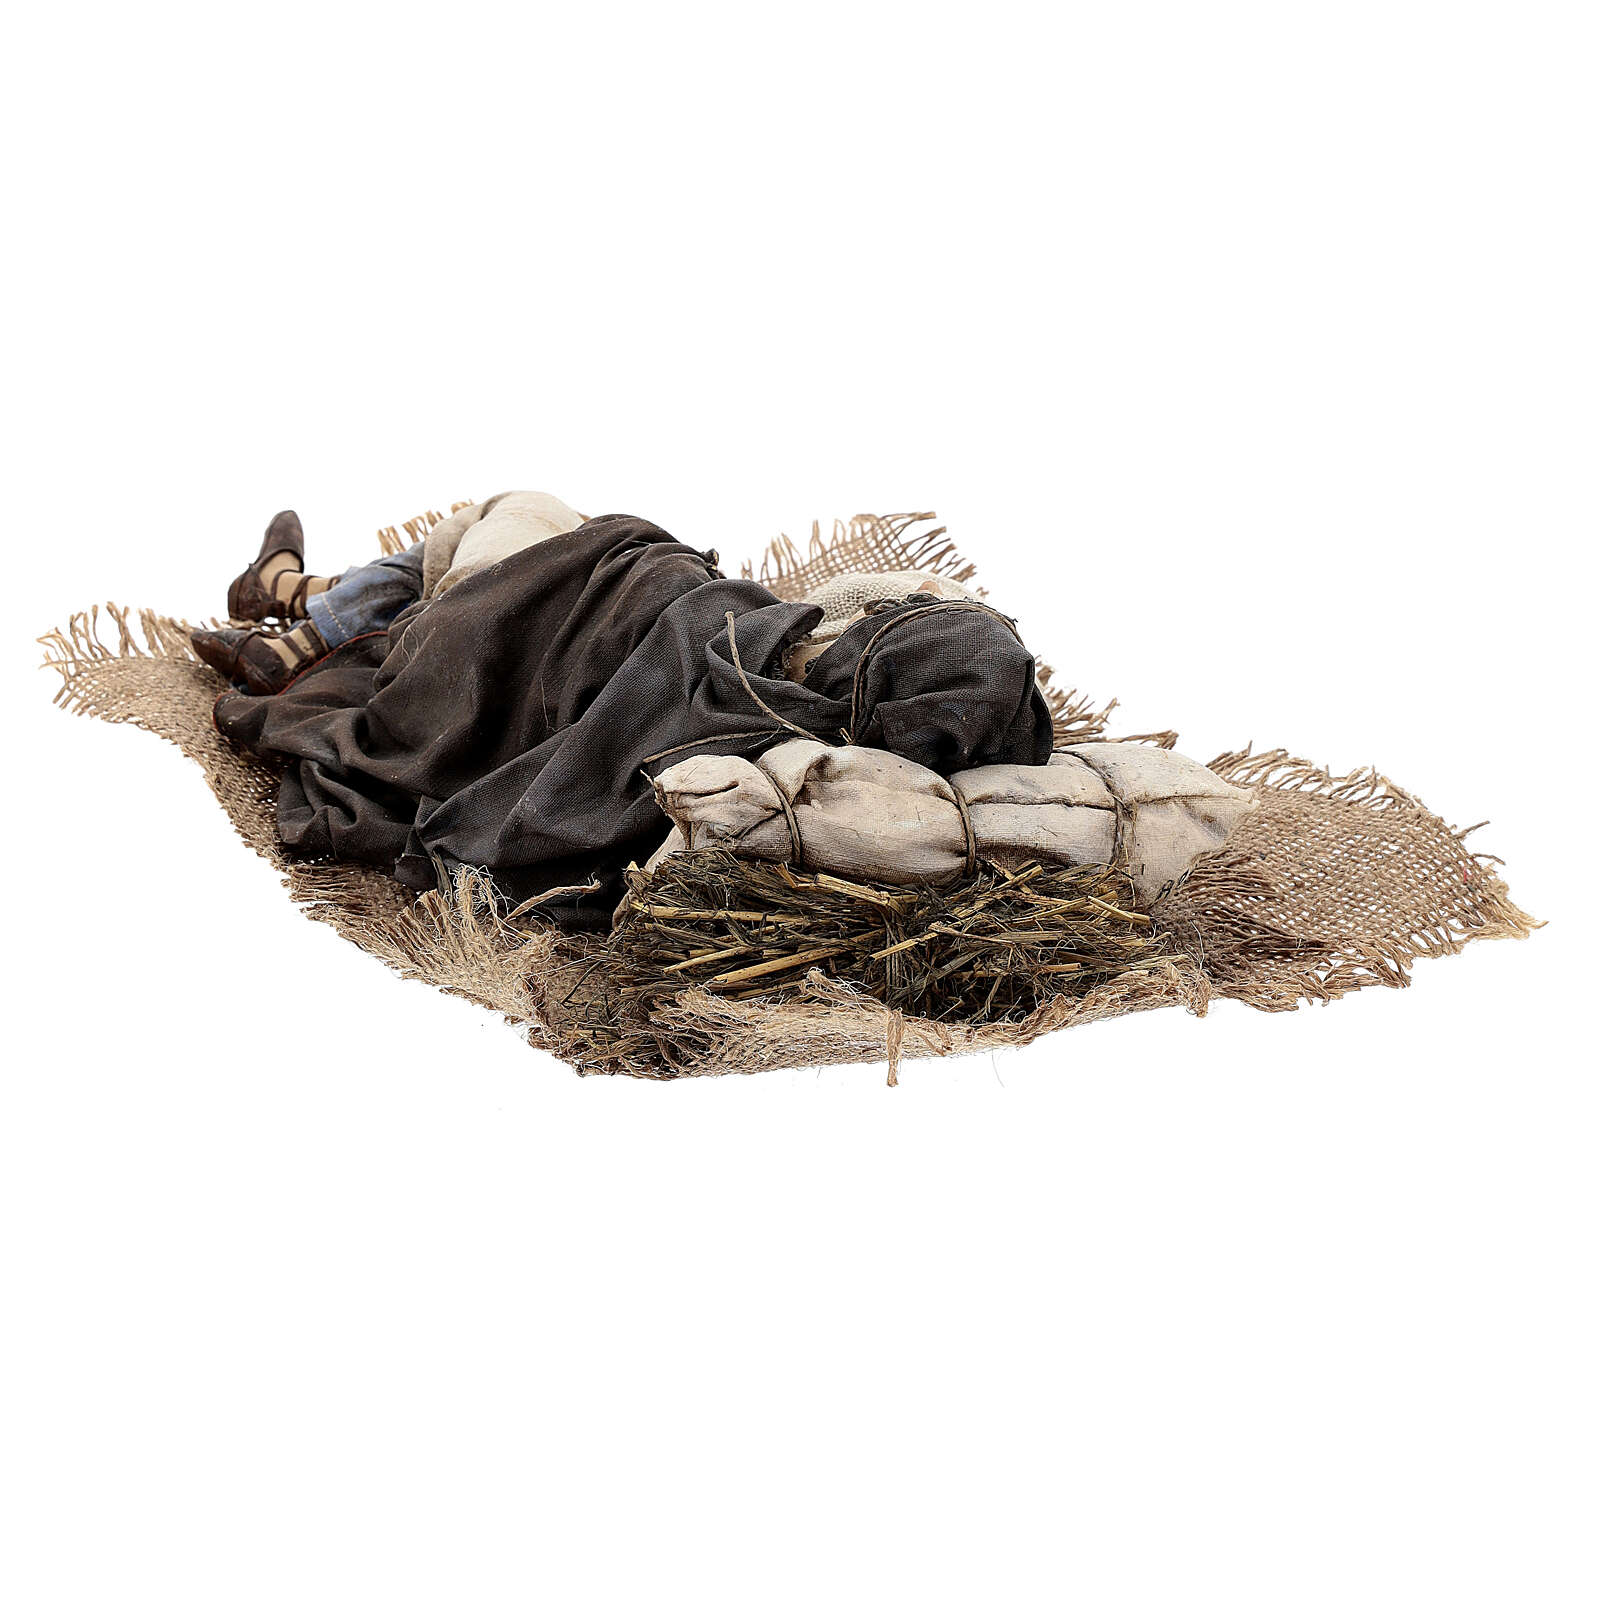 Dormiente 30 cm Presepe Angela Tripi 4